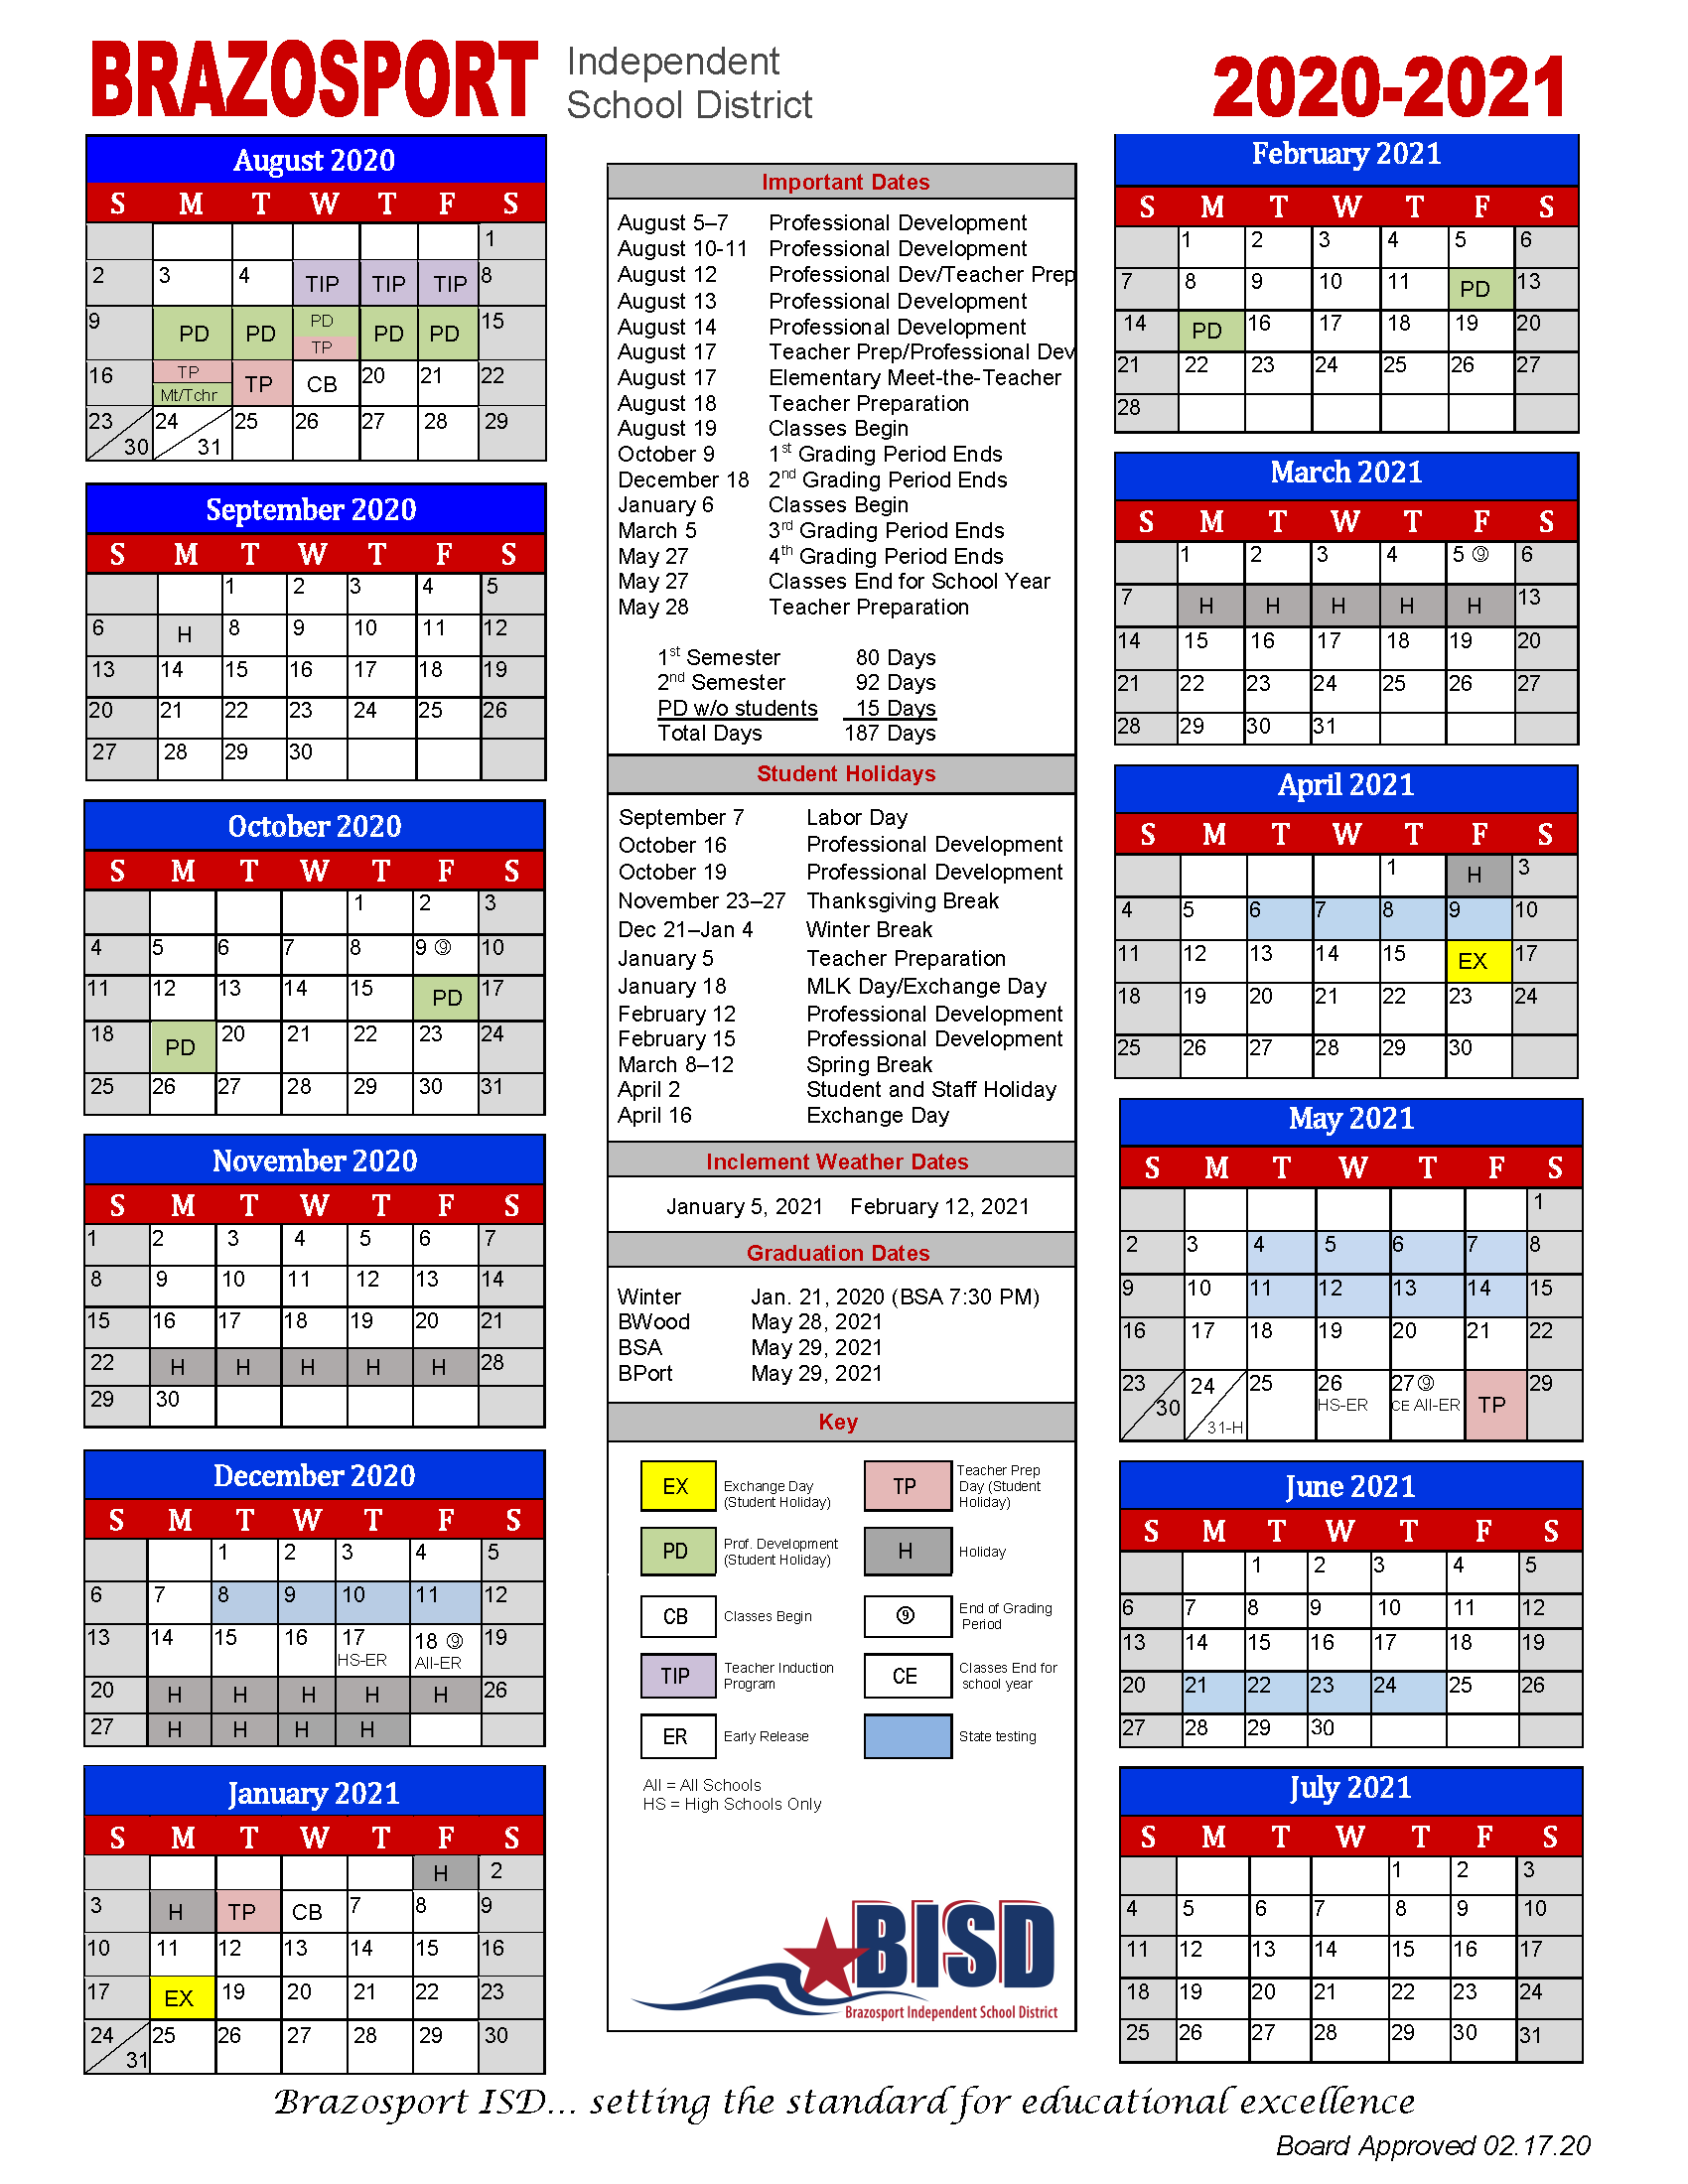 Board Approves 2020 2021 School Calendar - Brazosport With Regard To Brownsville Isd Calendar 2021